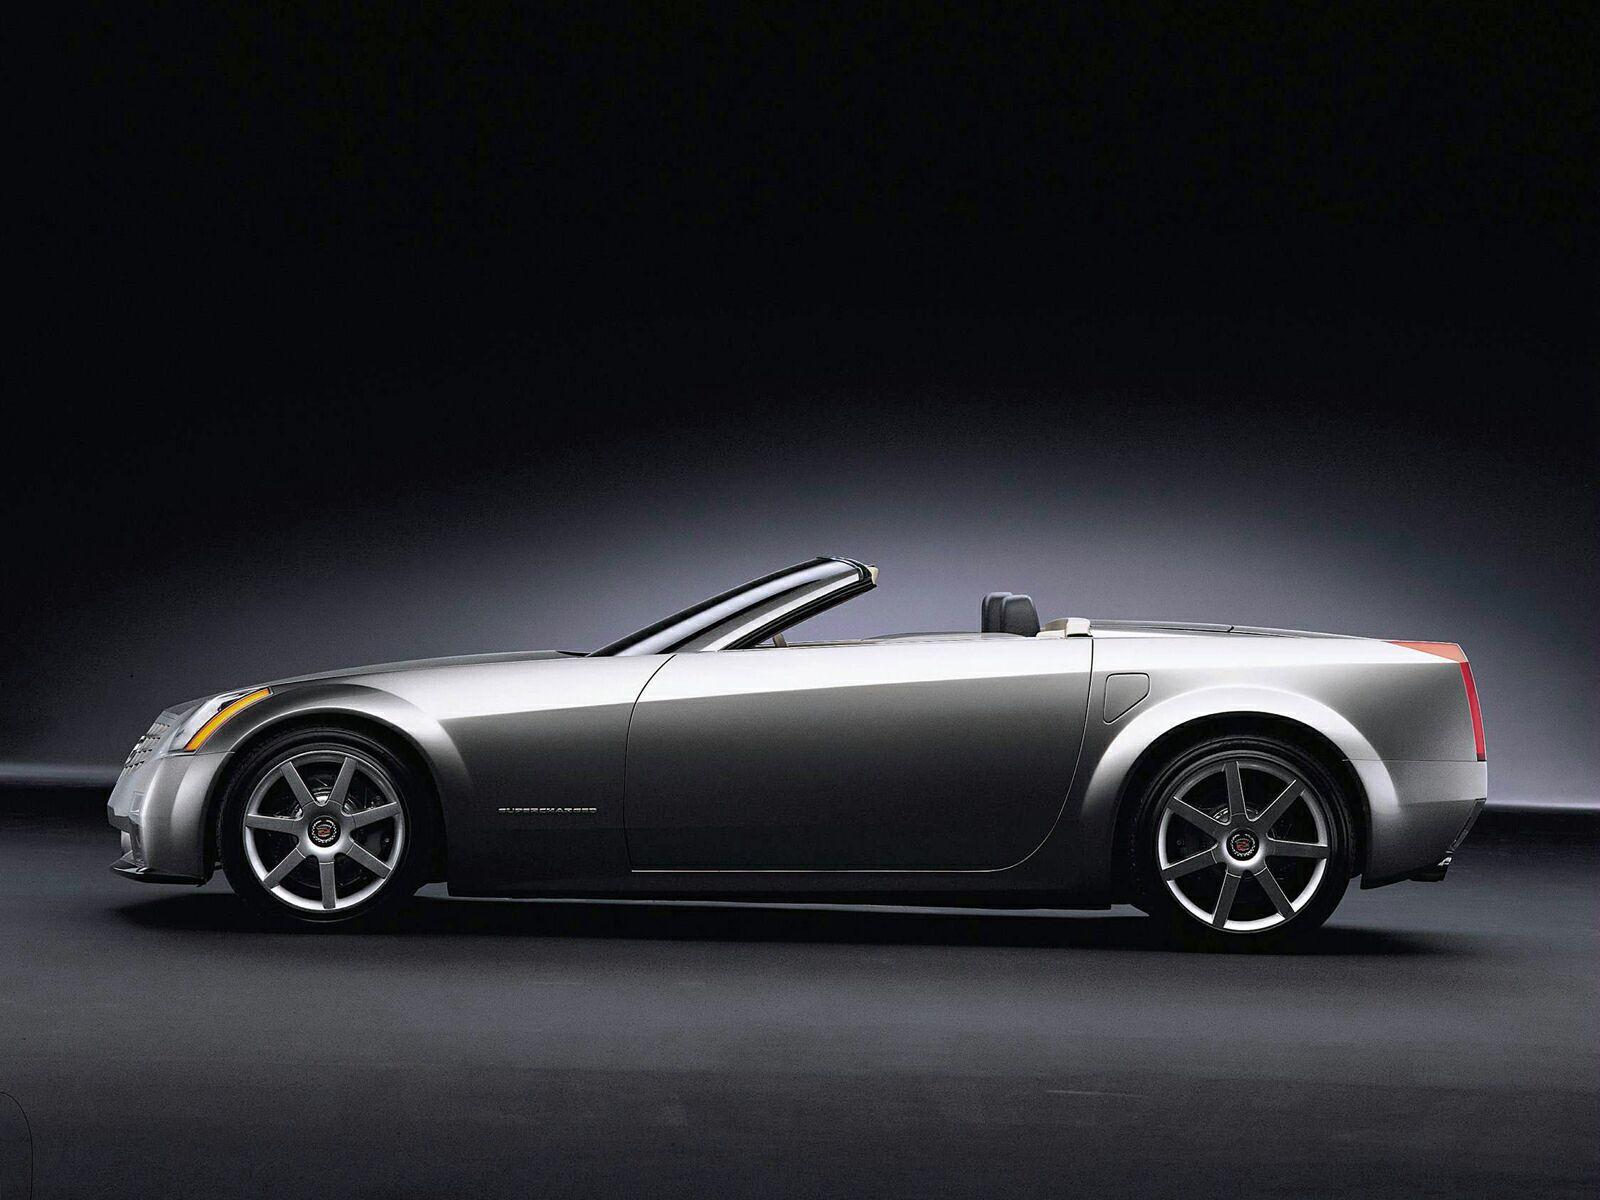 Cadillac Dealer Near Me >> Cadillac Evoq (1999) - Old Concept Cars